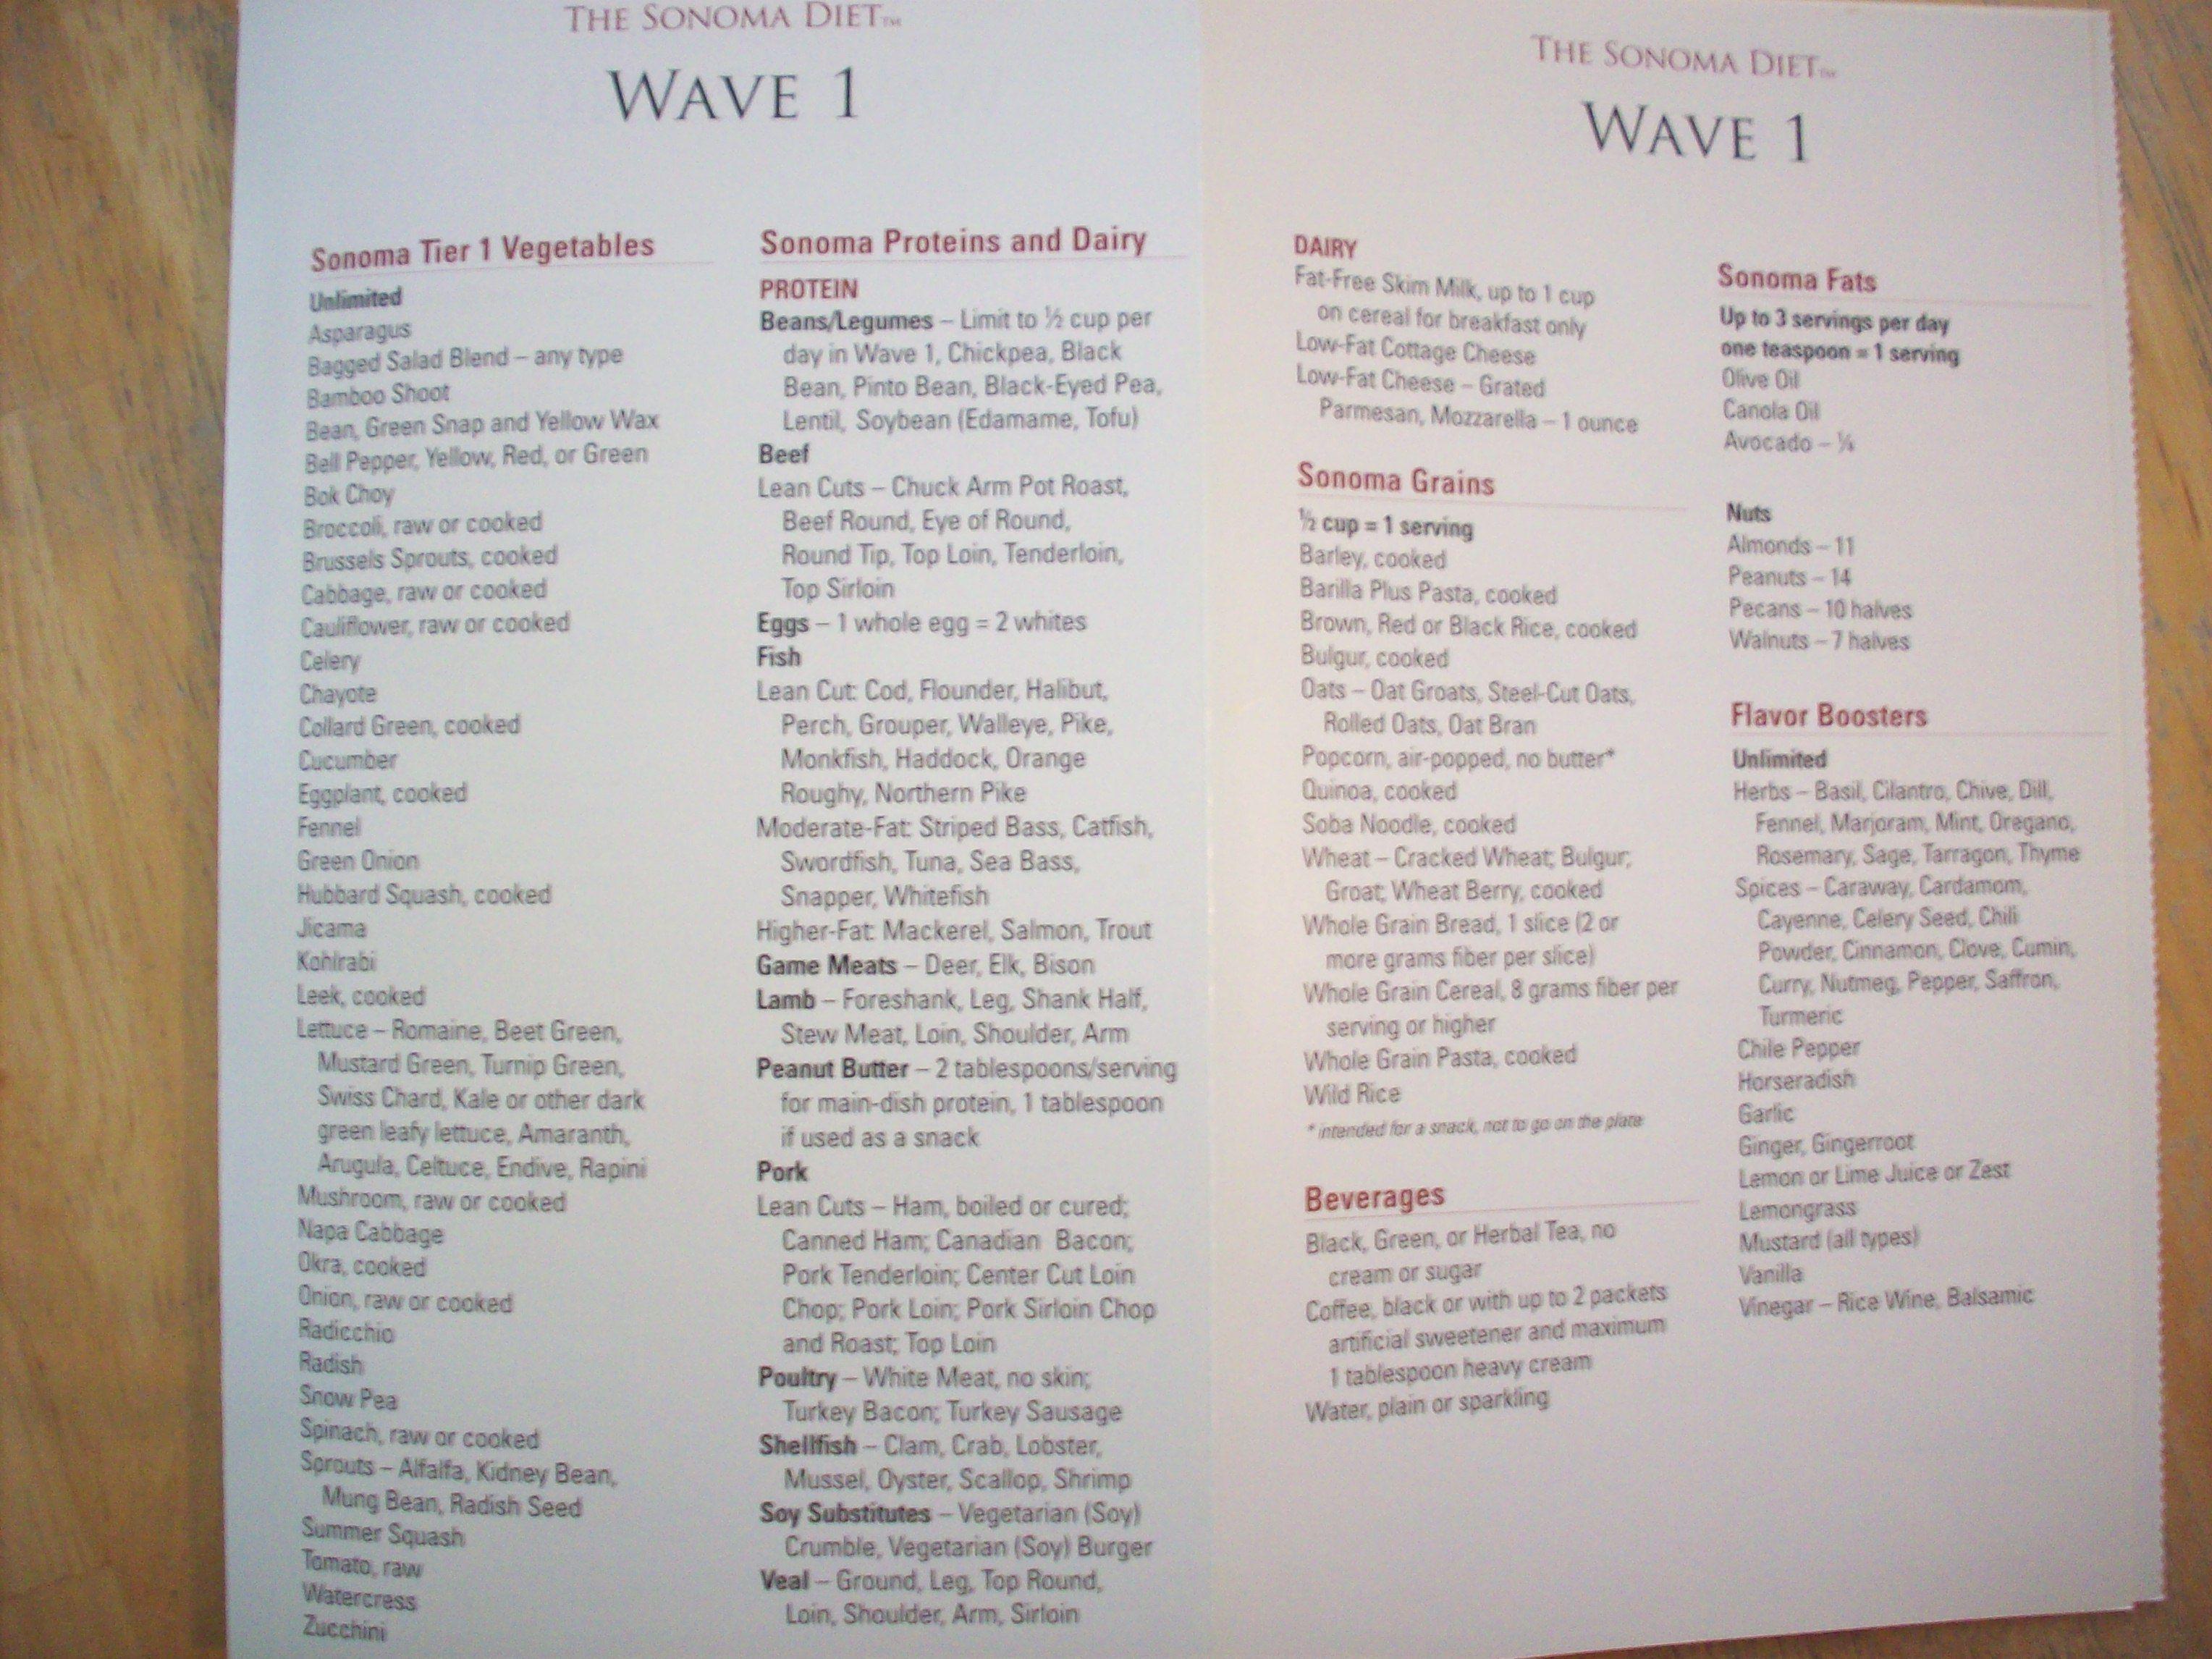 Sonoma Diet Food List Wave 1 2016 Body Makeover